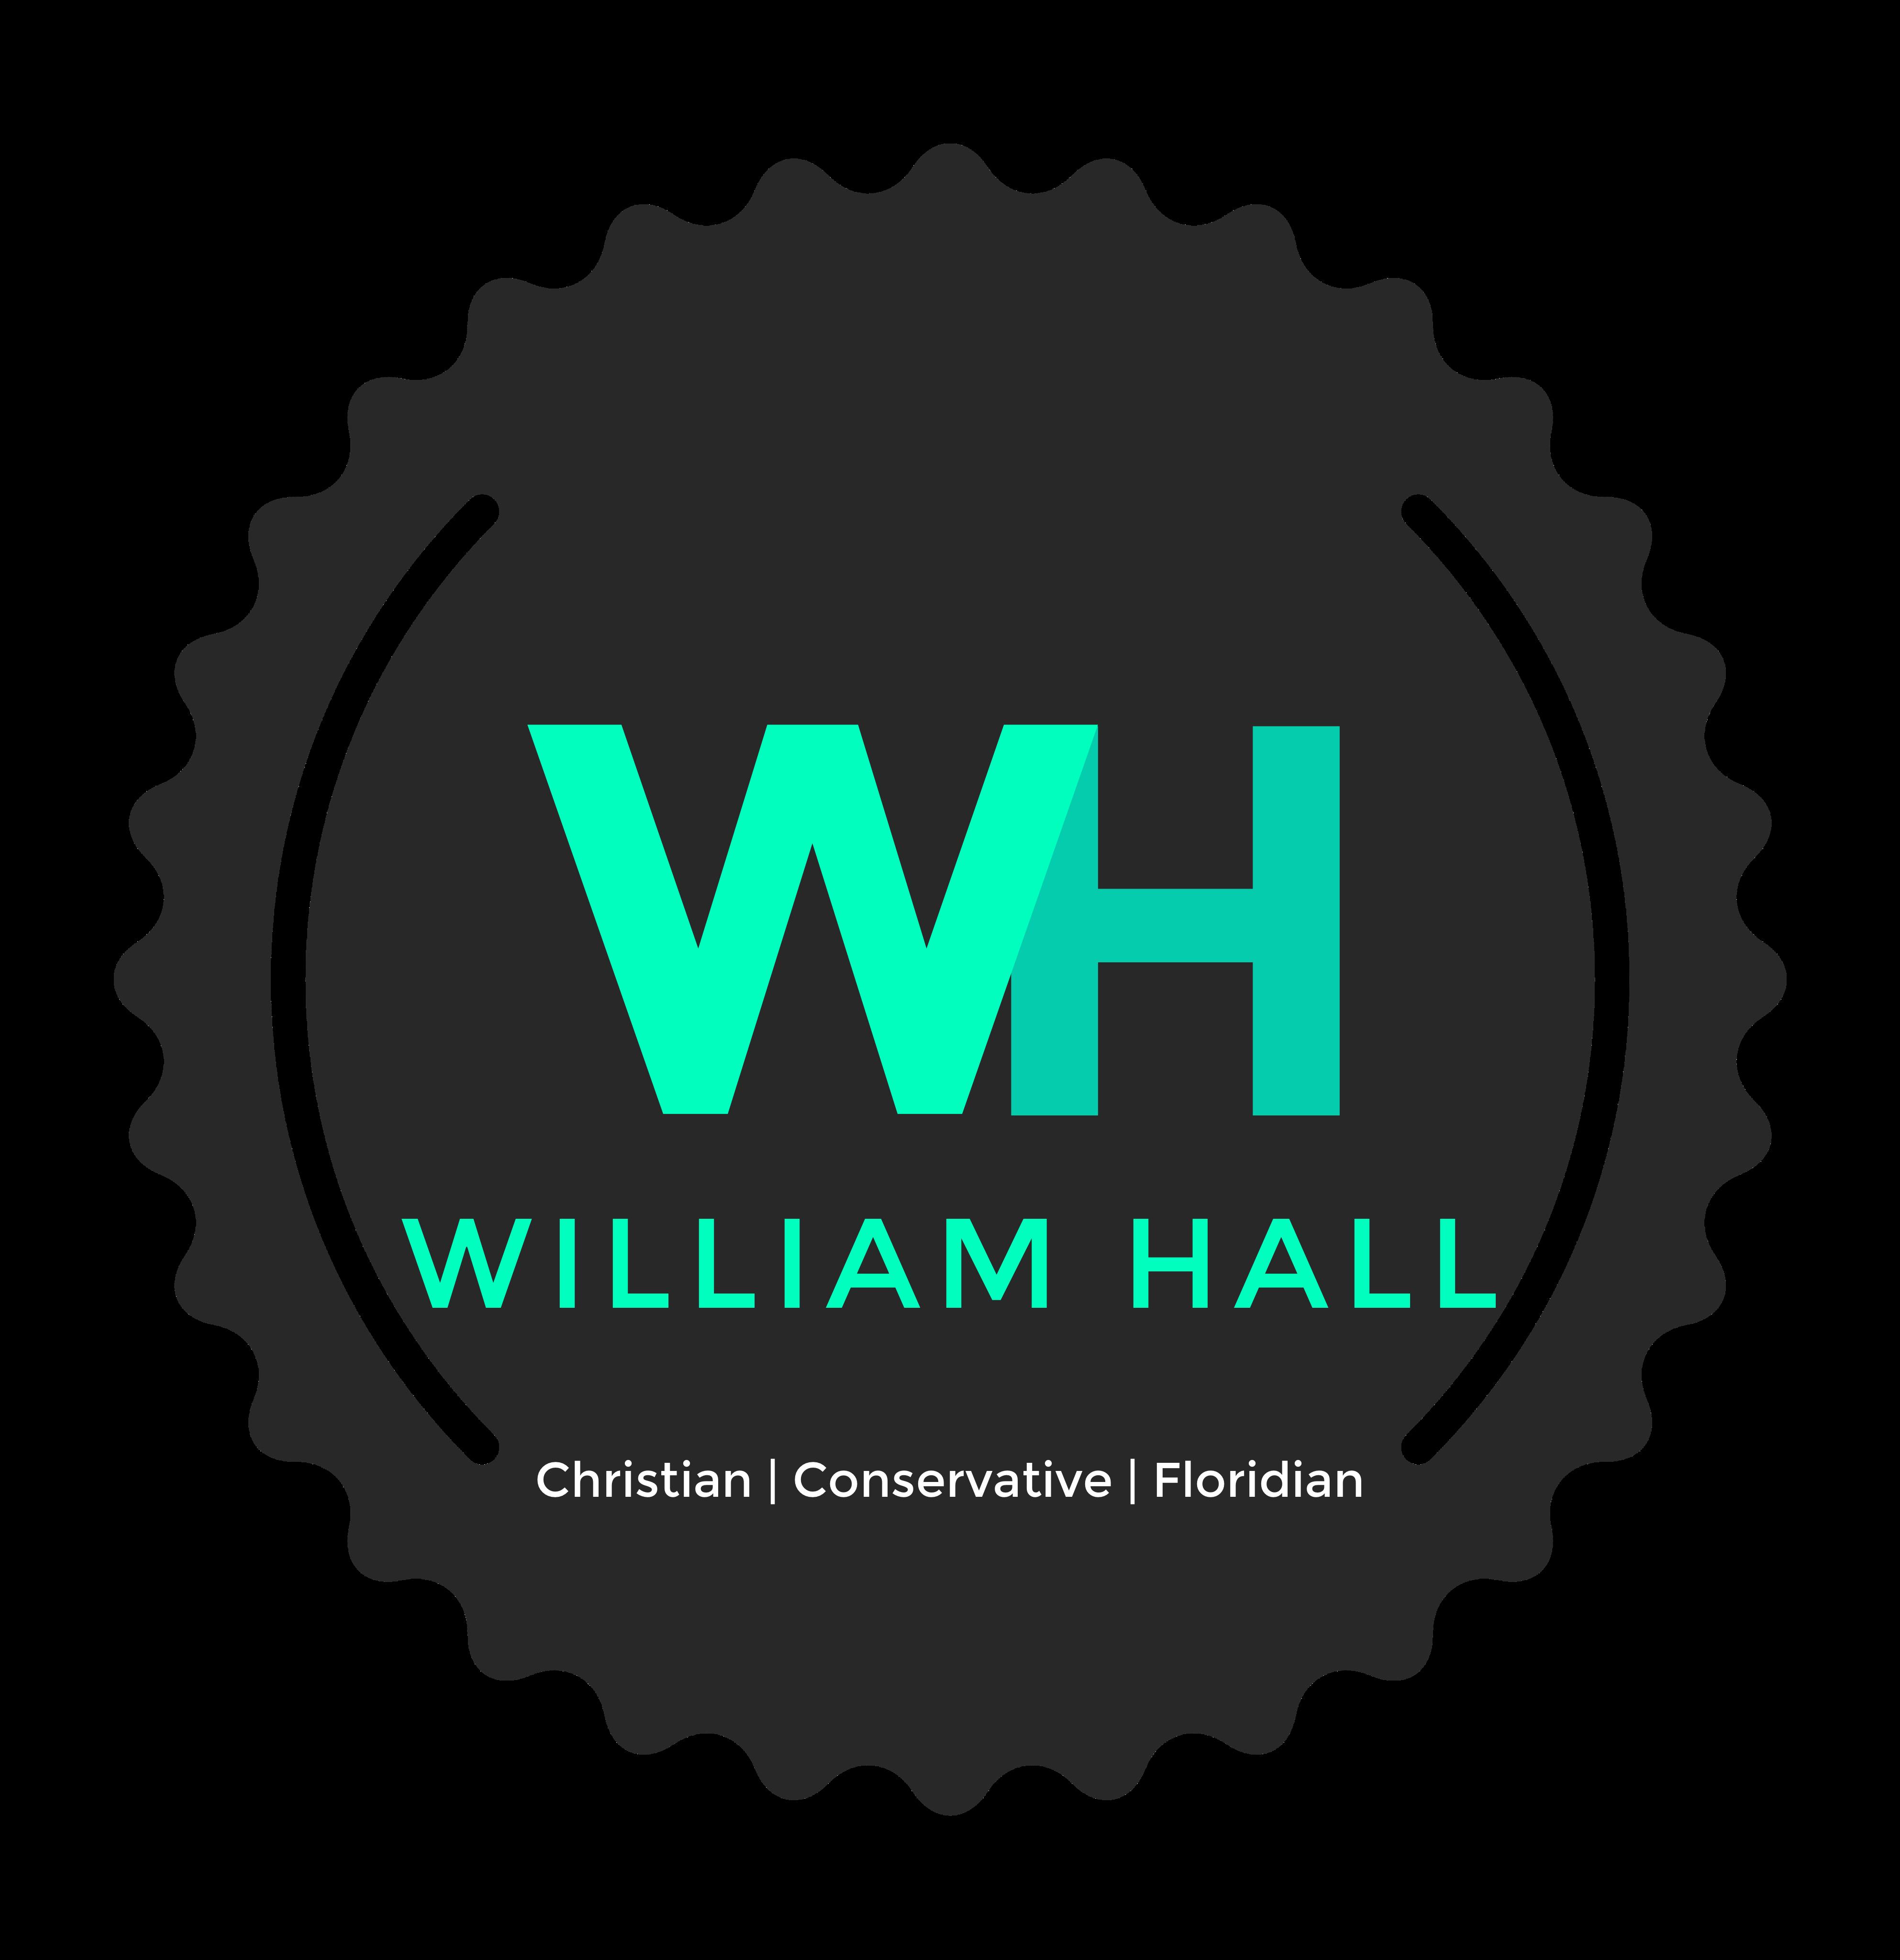 William Hall